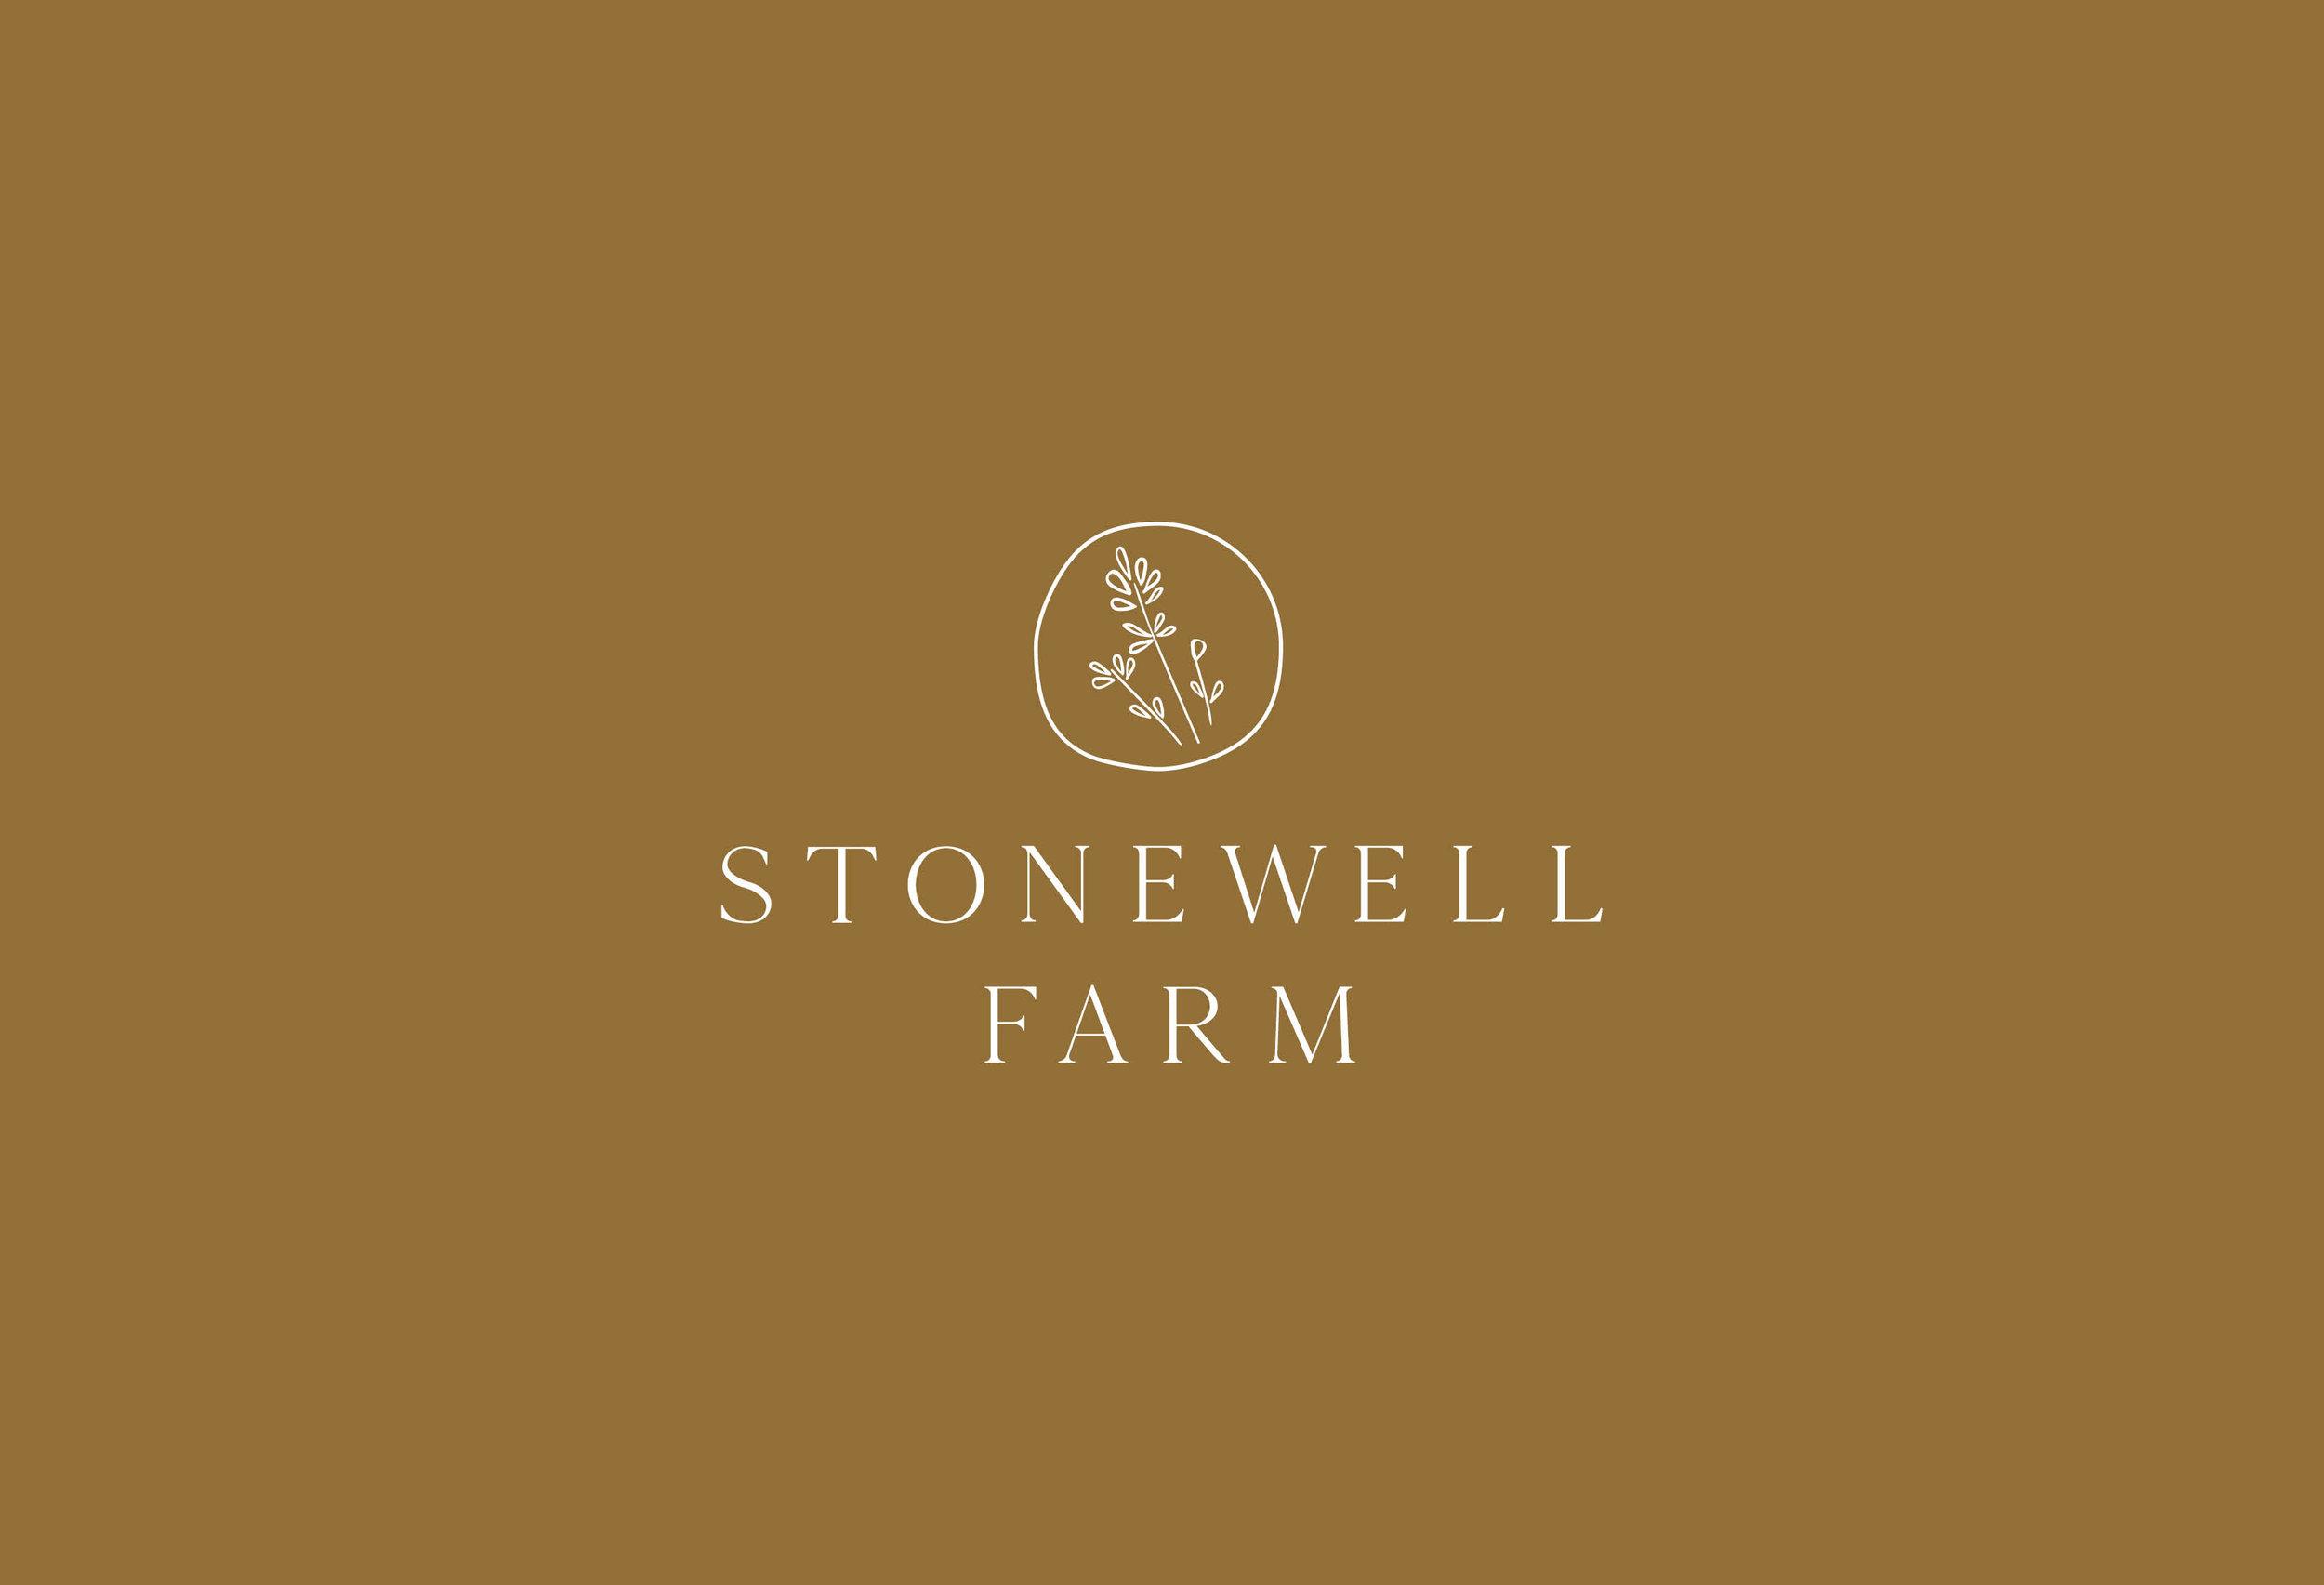 Stonewell Farm.jpg